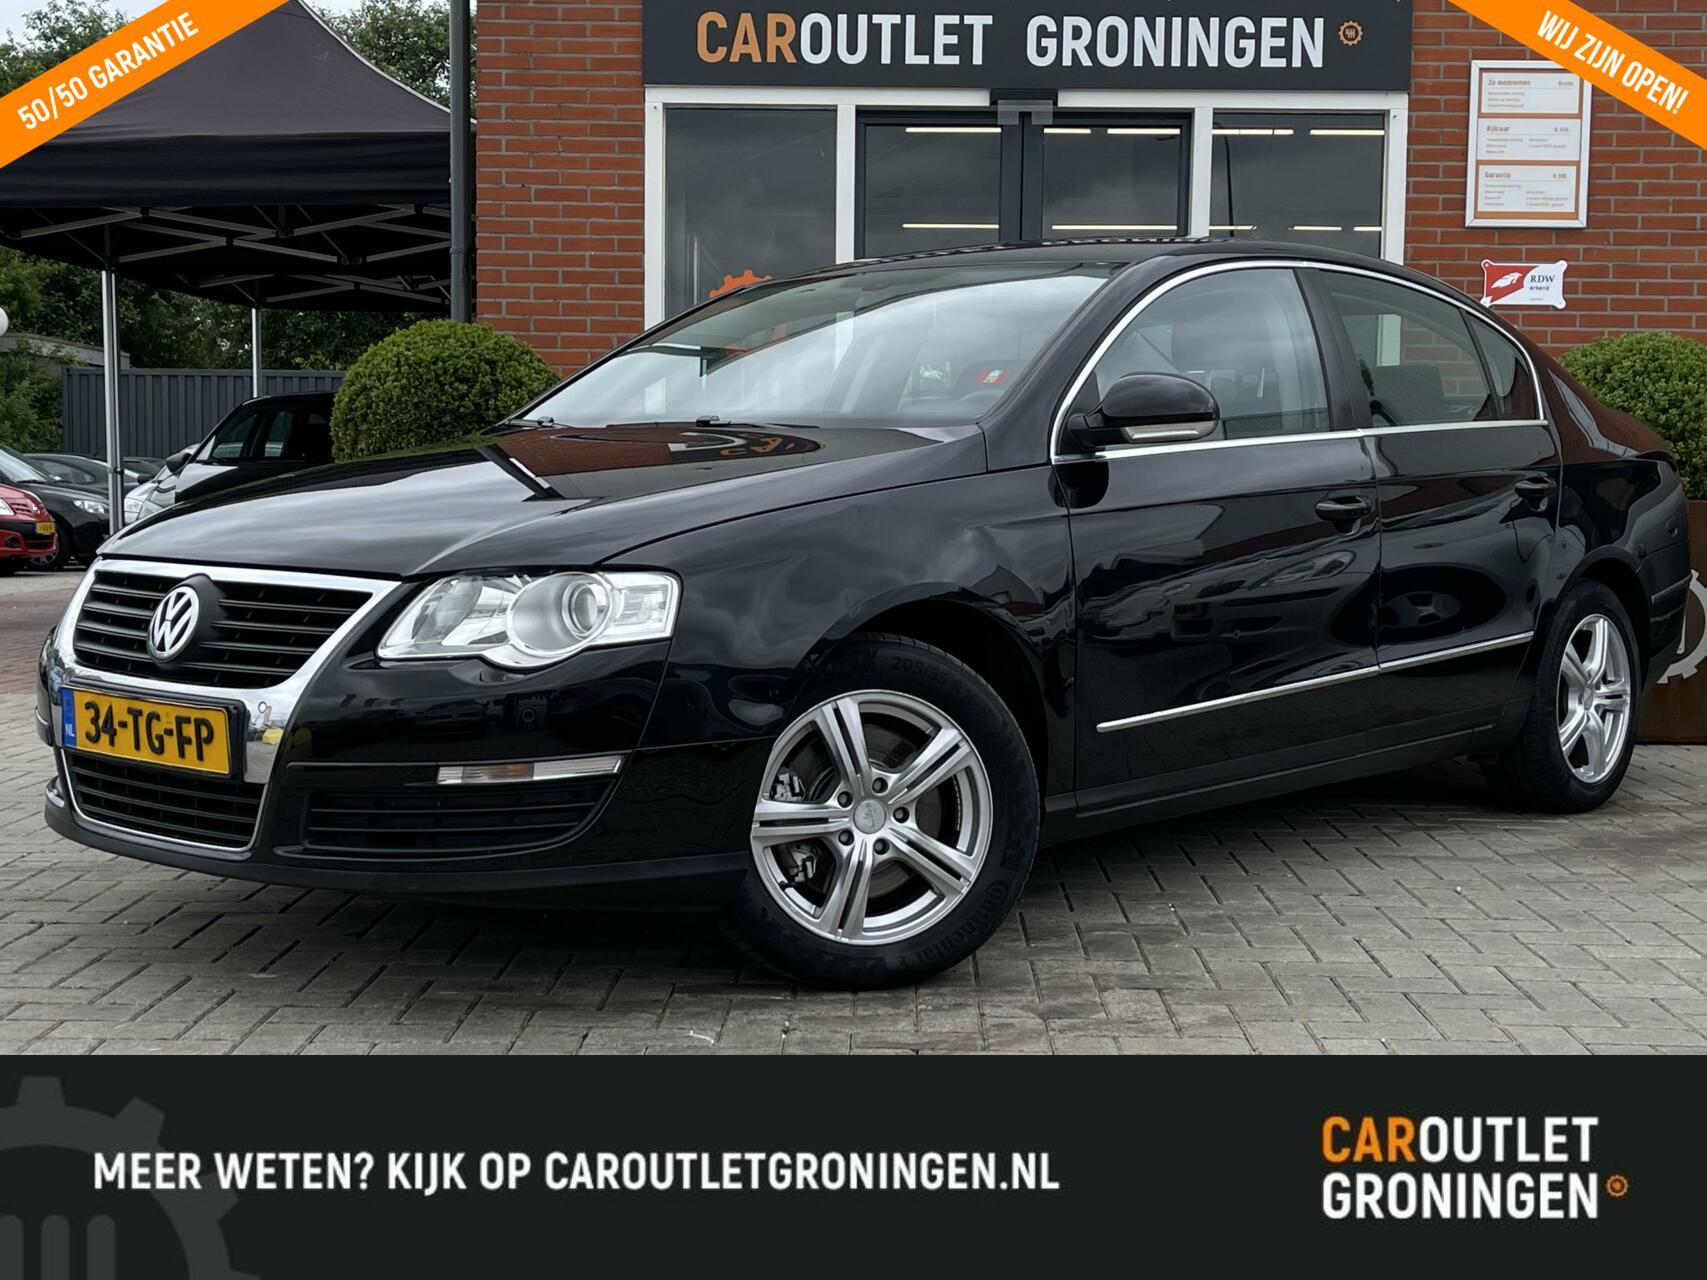 Caroutlet Groningen - Volkswagen Passat 2.0 FSI Comfortline Business | SEDAN | CLIMA | CRUISE